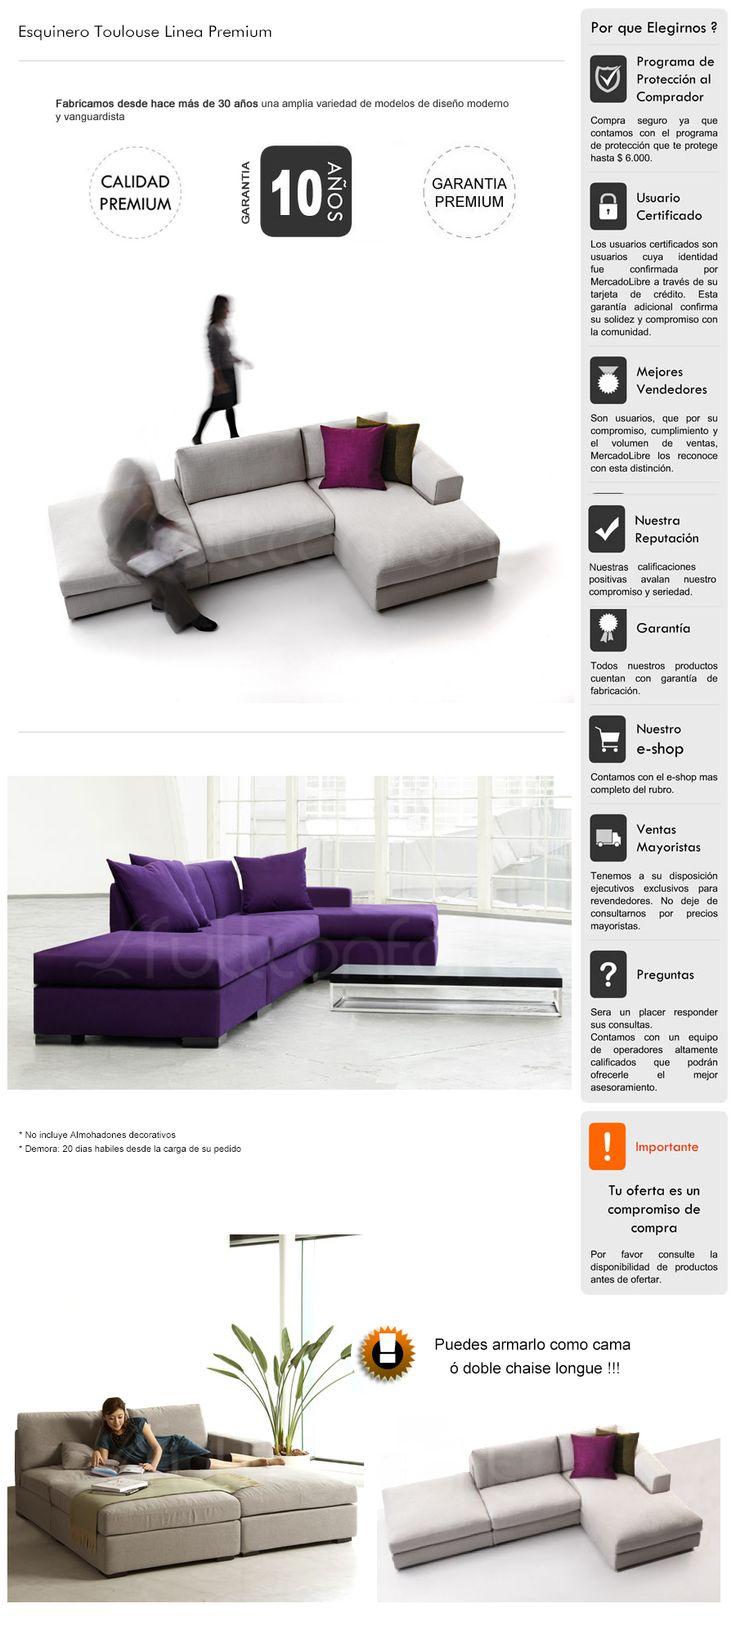 M s de 25 ideas incre bles sobre sofa esquinero en - Esquineros para pared ...